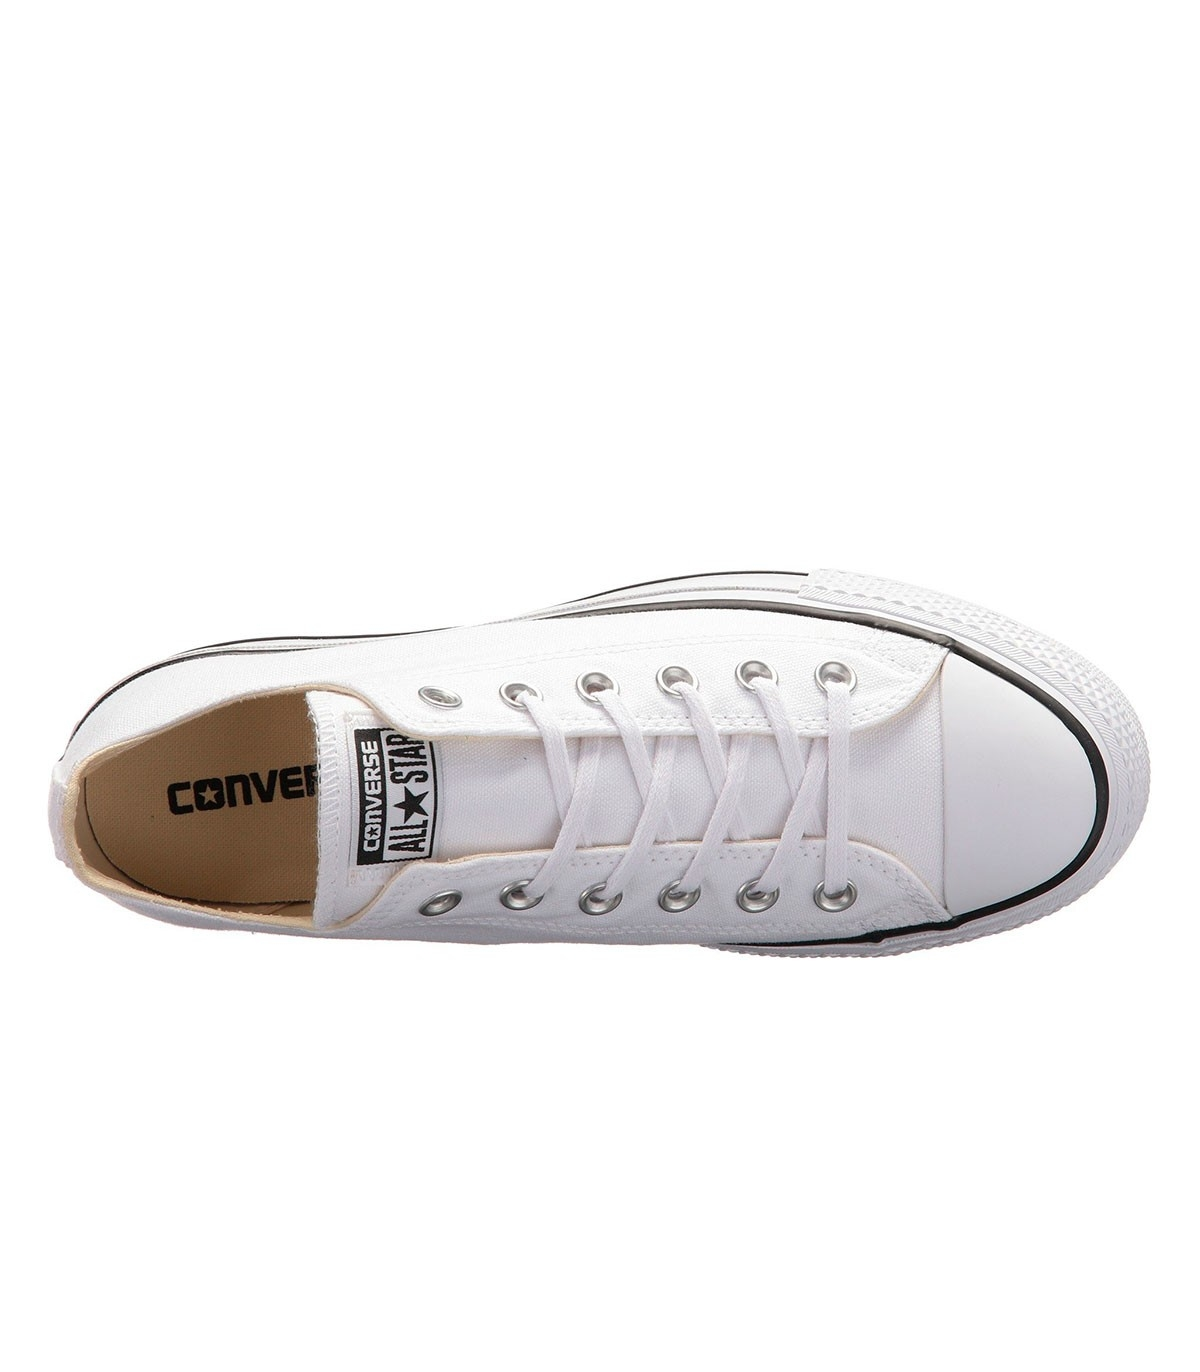 370bdc391 Zapatillas Converse Chuck Taylor All Star Lift